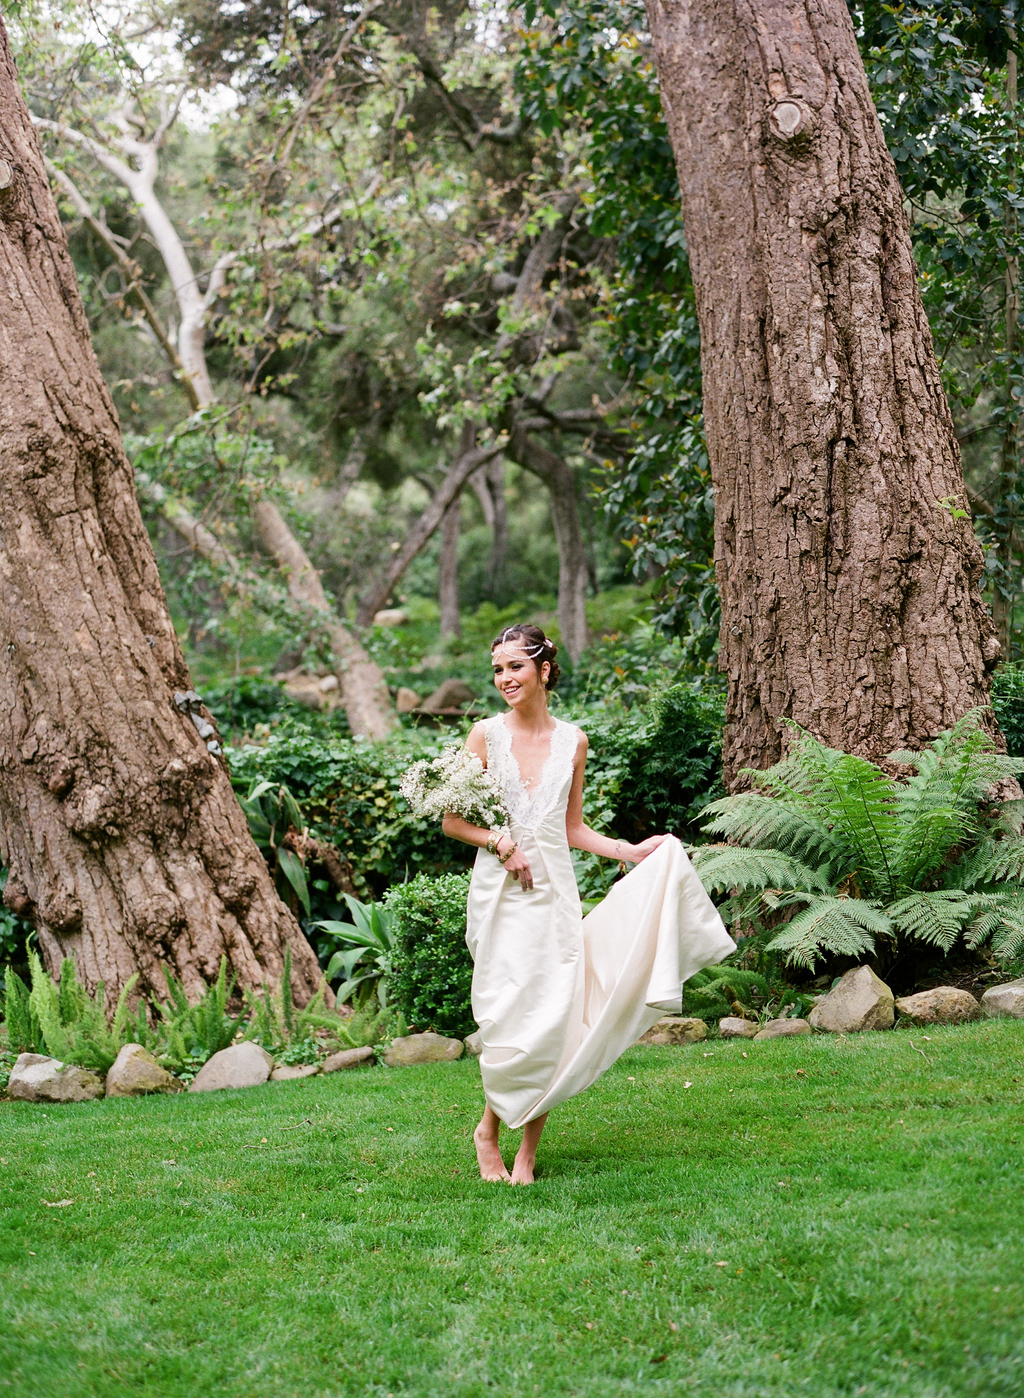 Styled-wedding-santa-barbara-chic-beaux-arts-photographie-italian-bohemian-wedding-bride-wedding-dress-017.full